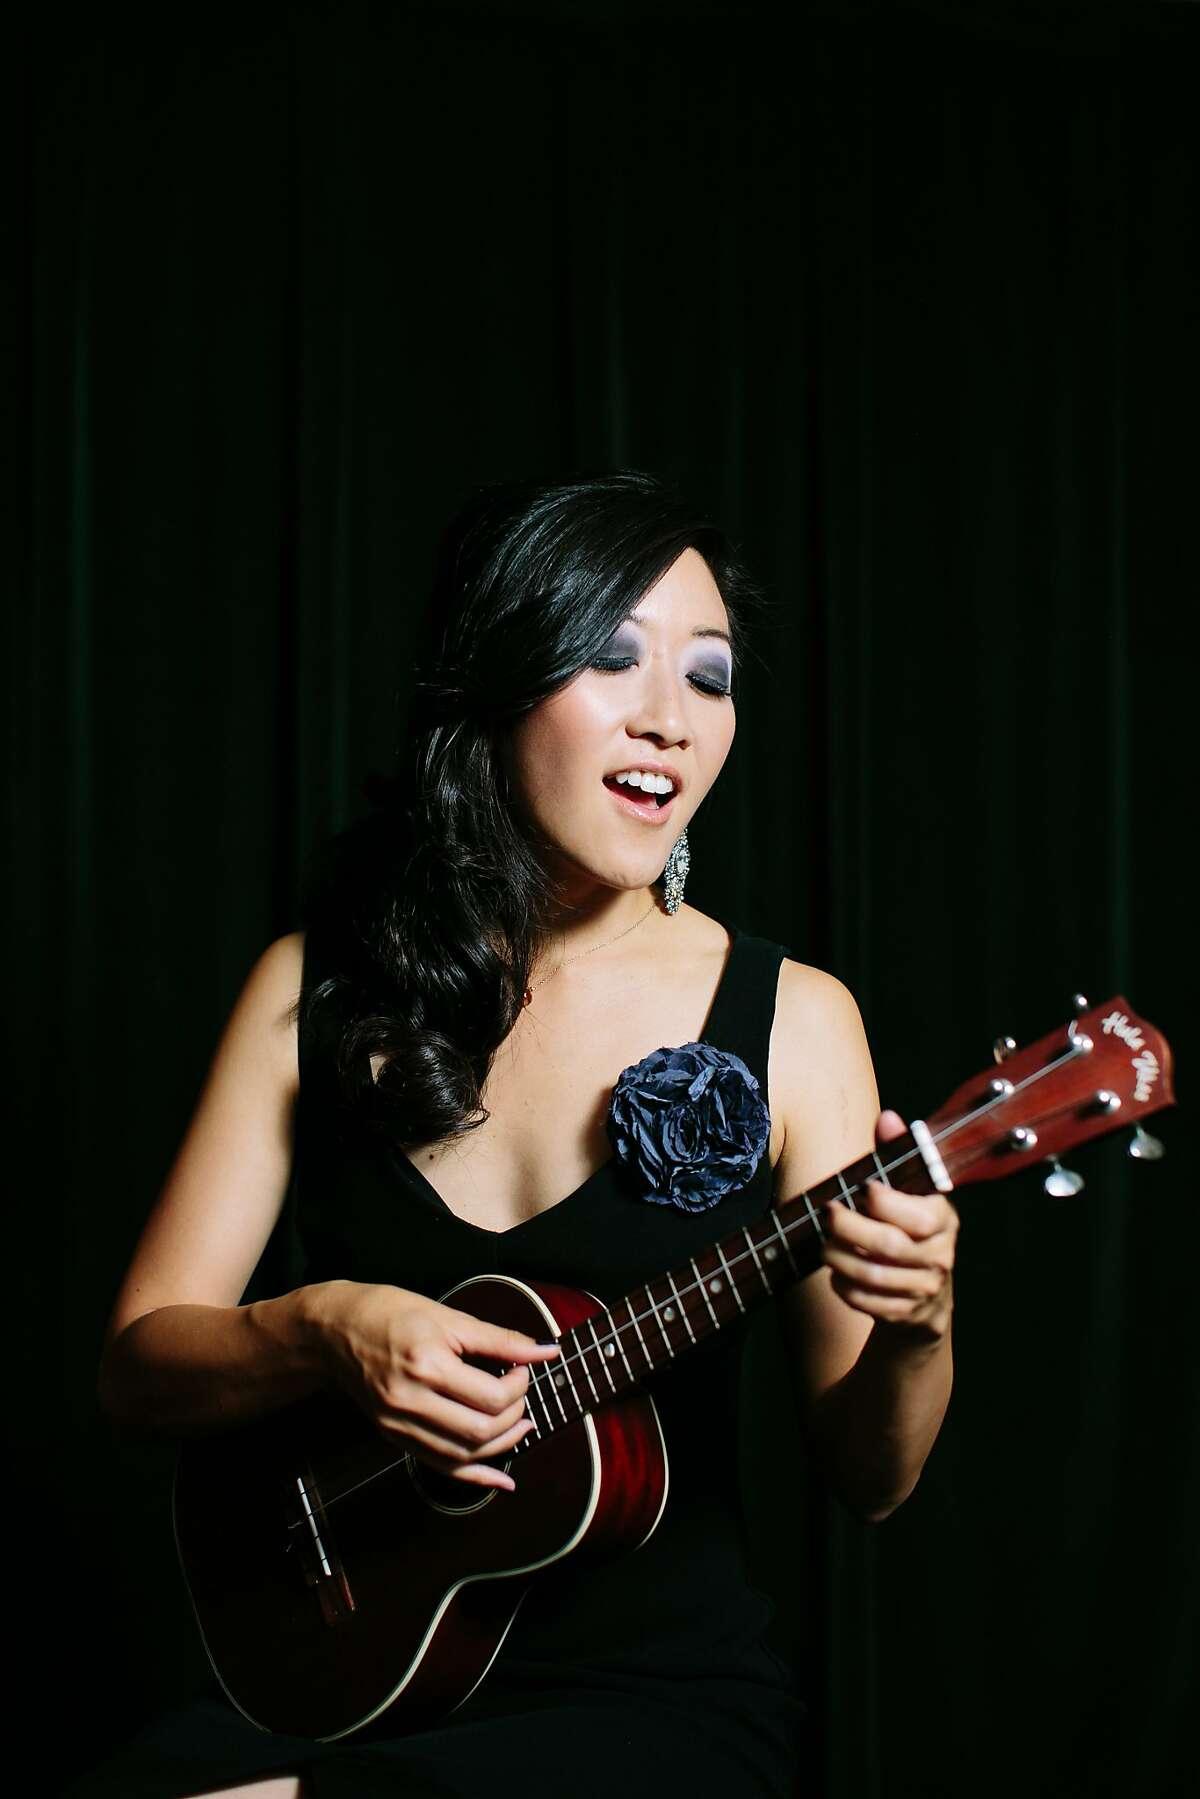 Youtuber and ukulele star Cynthia Lin co-hosts the SF Uke Jam.